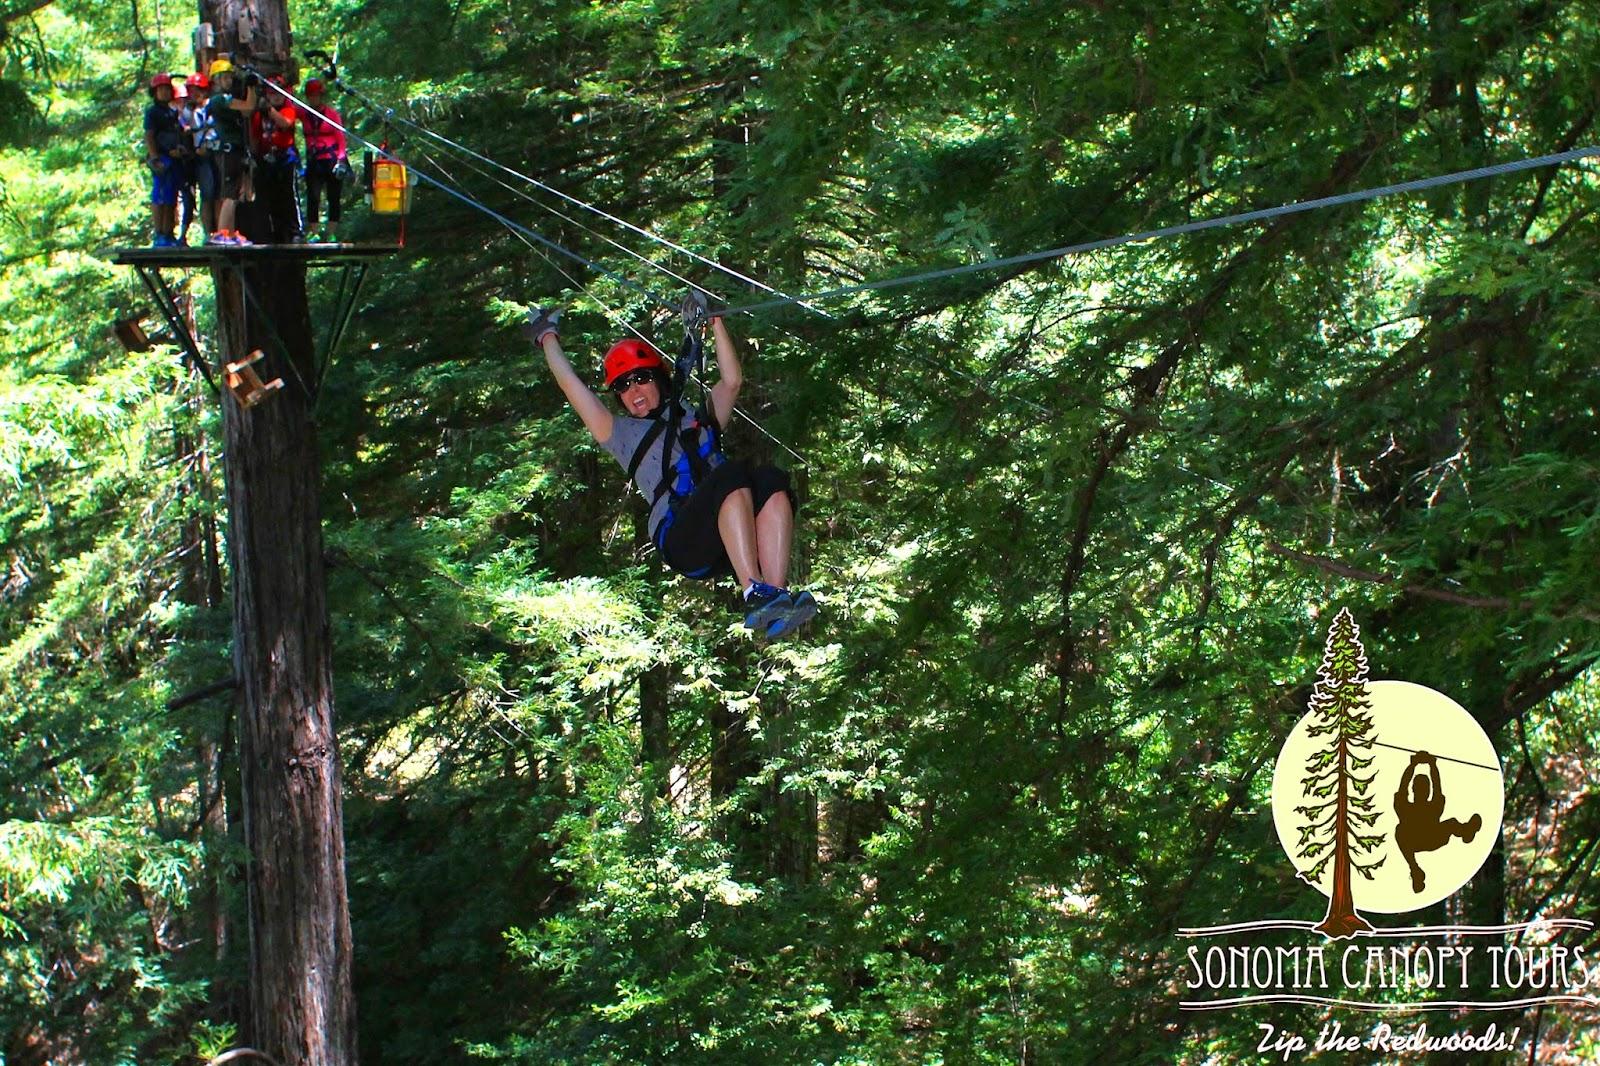 Lisa Kentzell Zip Lining 2014 - Lisa showing off & Sonoma Canopy Tours - Zip Lining 2014 | Life of Lisa Laporte